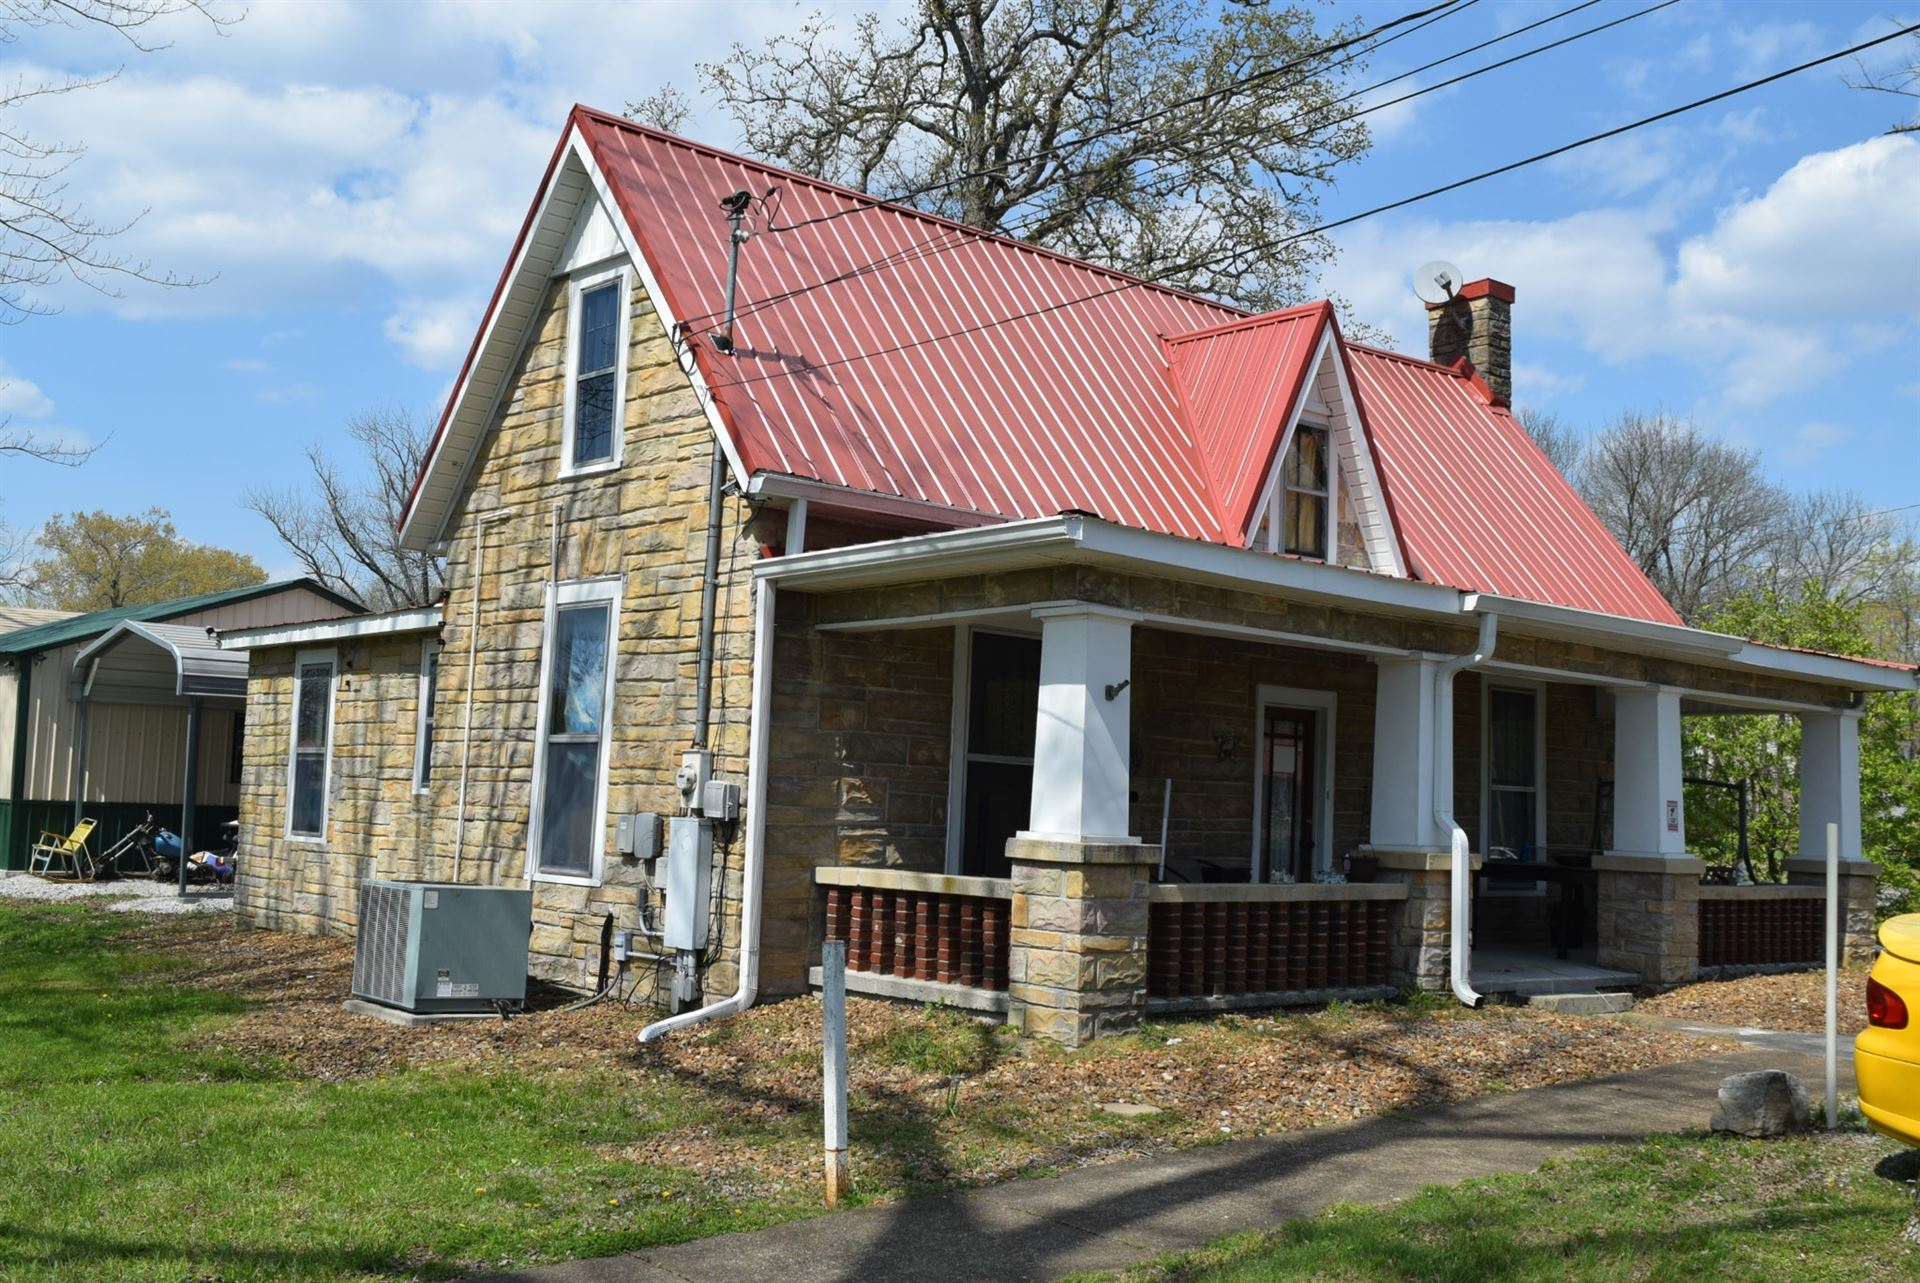 315 E Grundy St, Tullahoma, TN 37388 - MLS#: 2242440